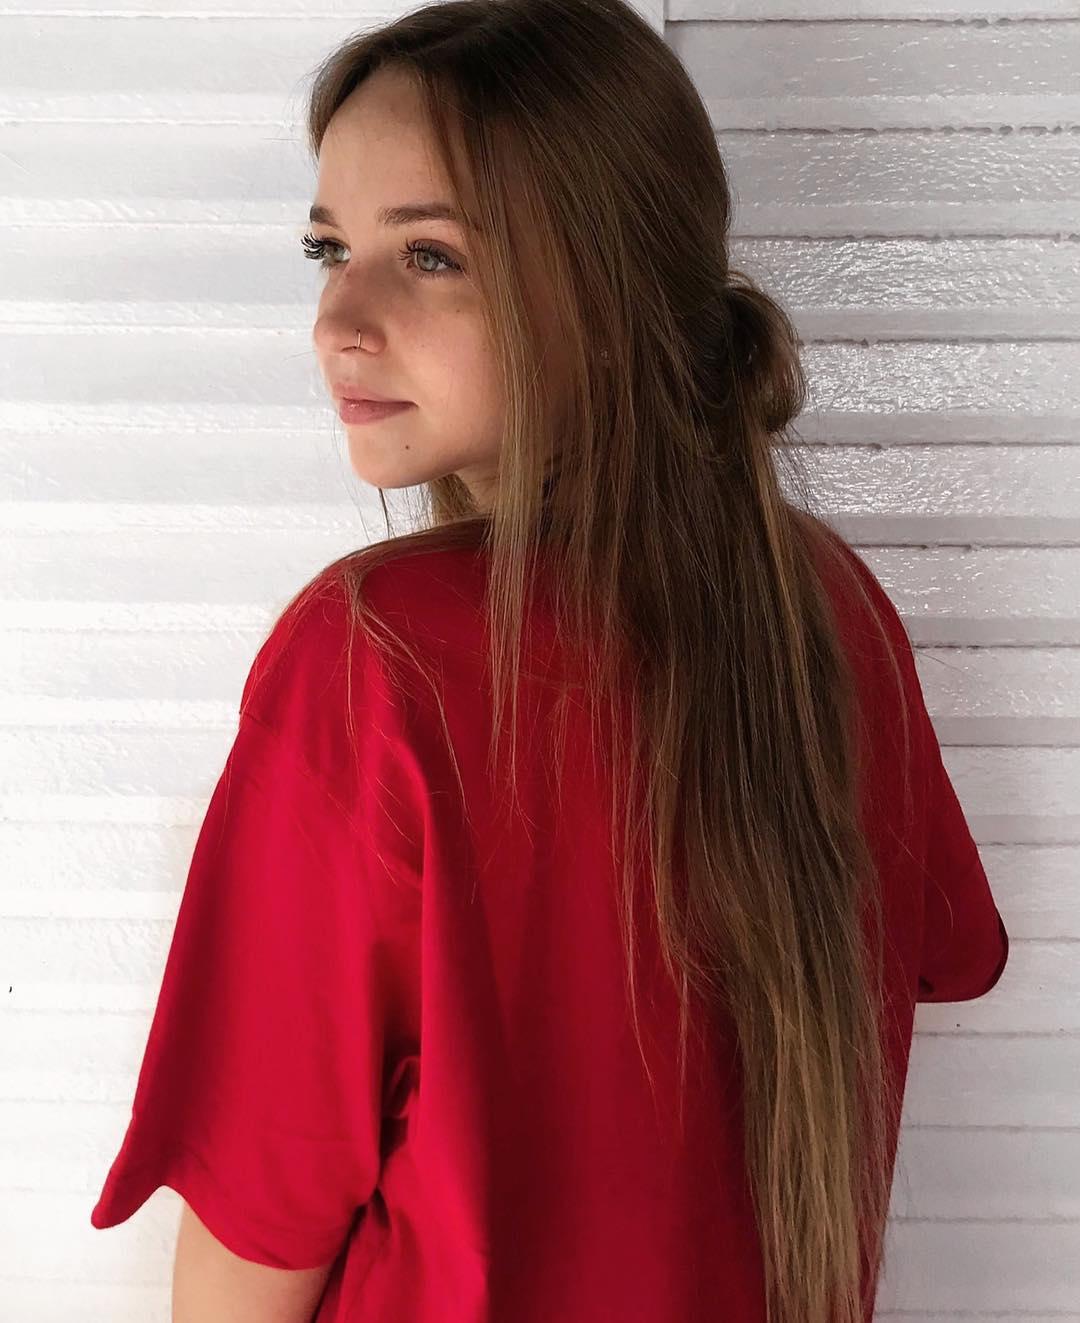 Raphaella-Bonaldi-Sobral-Wallpapers-Insta-Fit-Bio-5